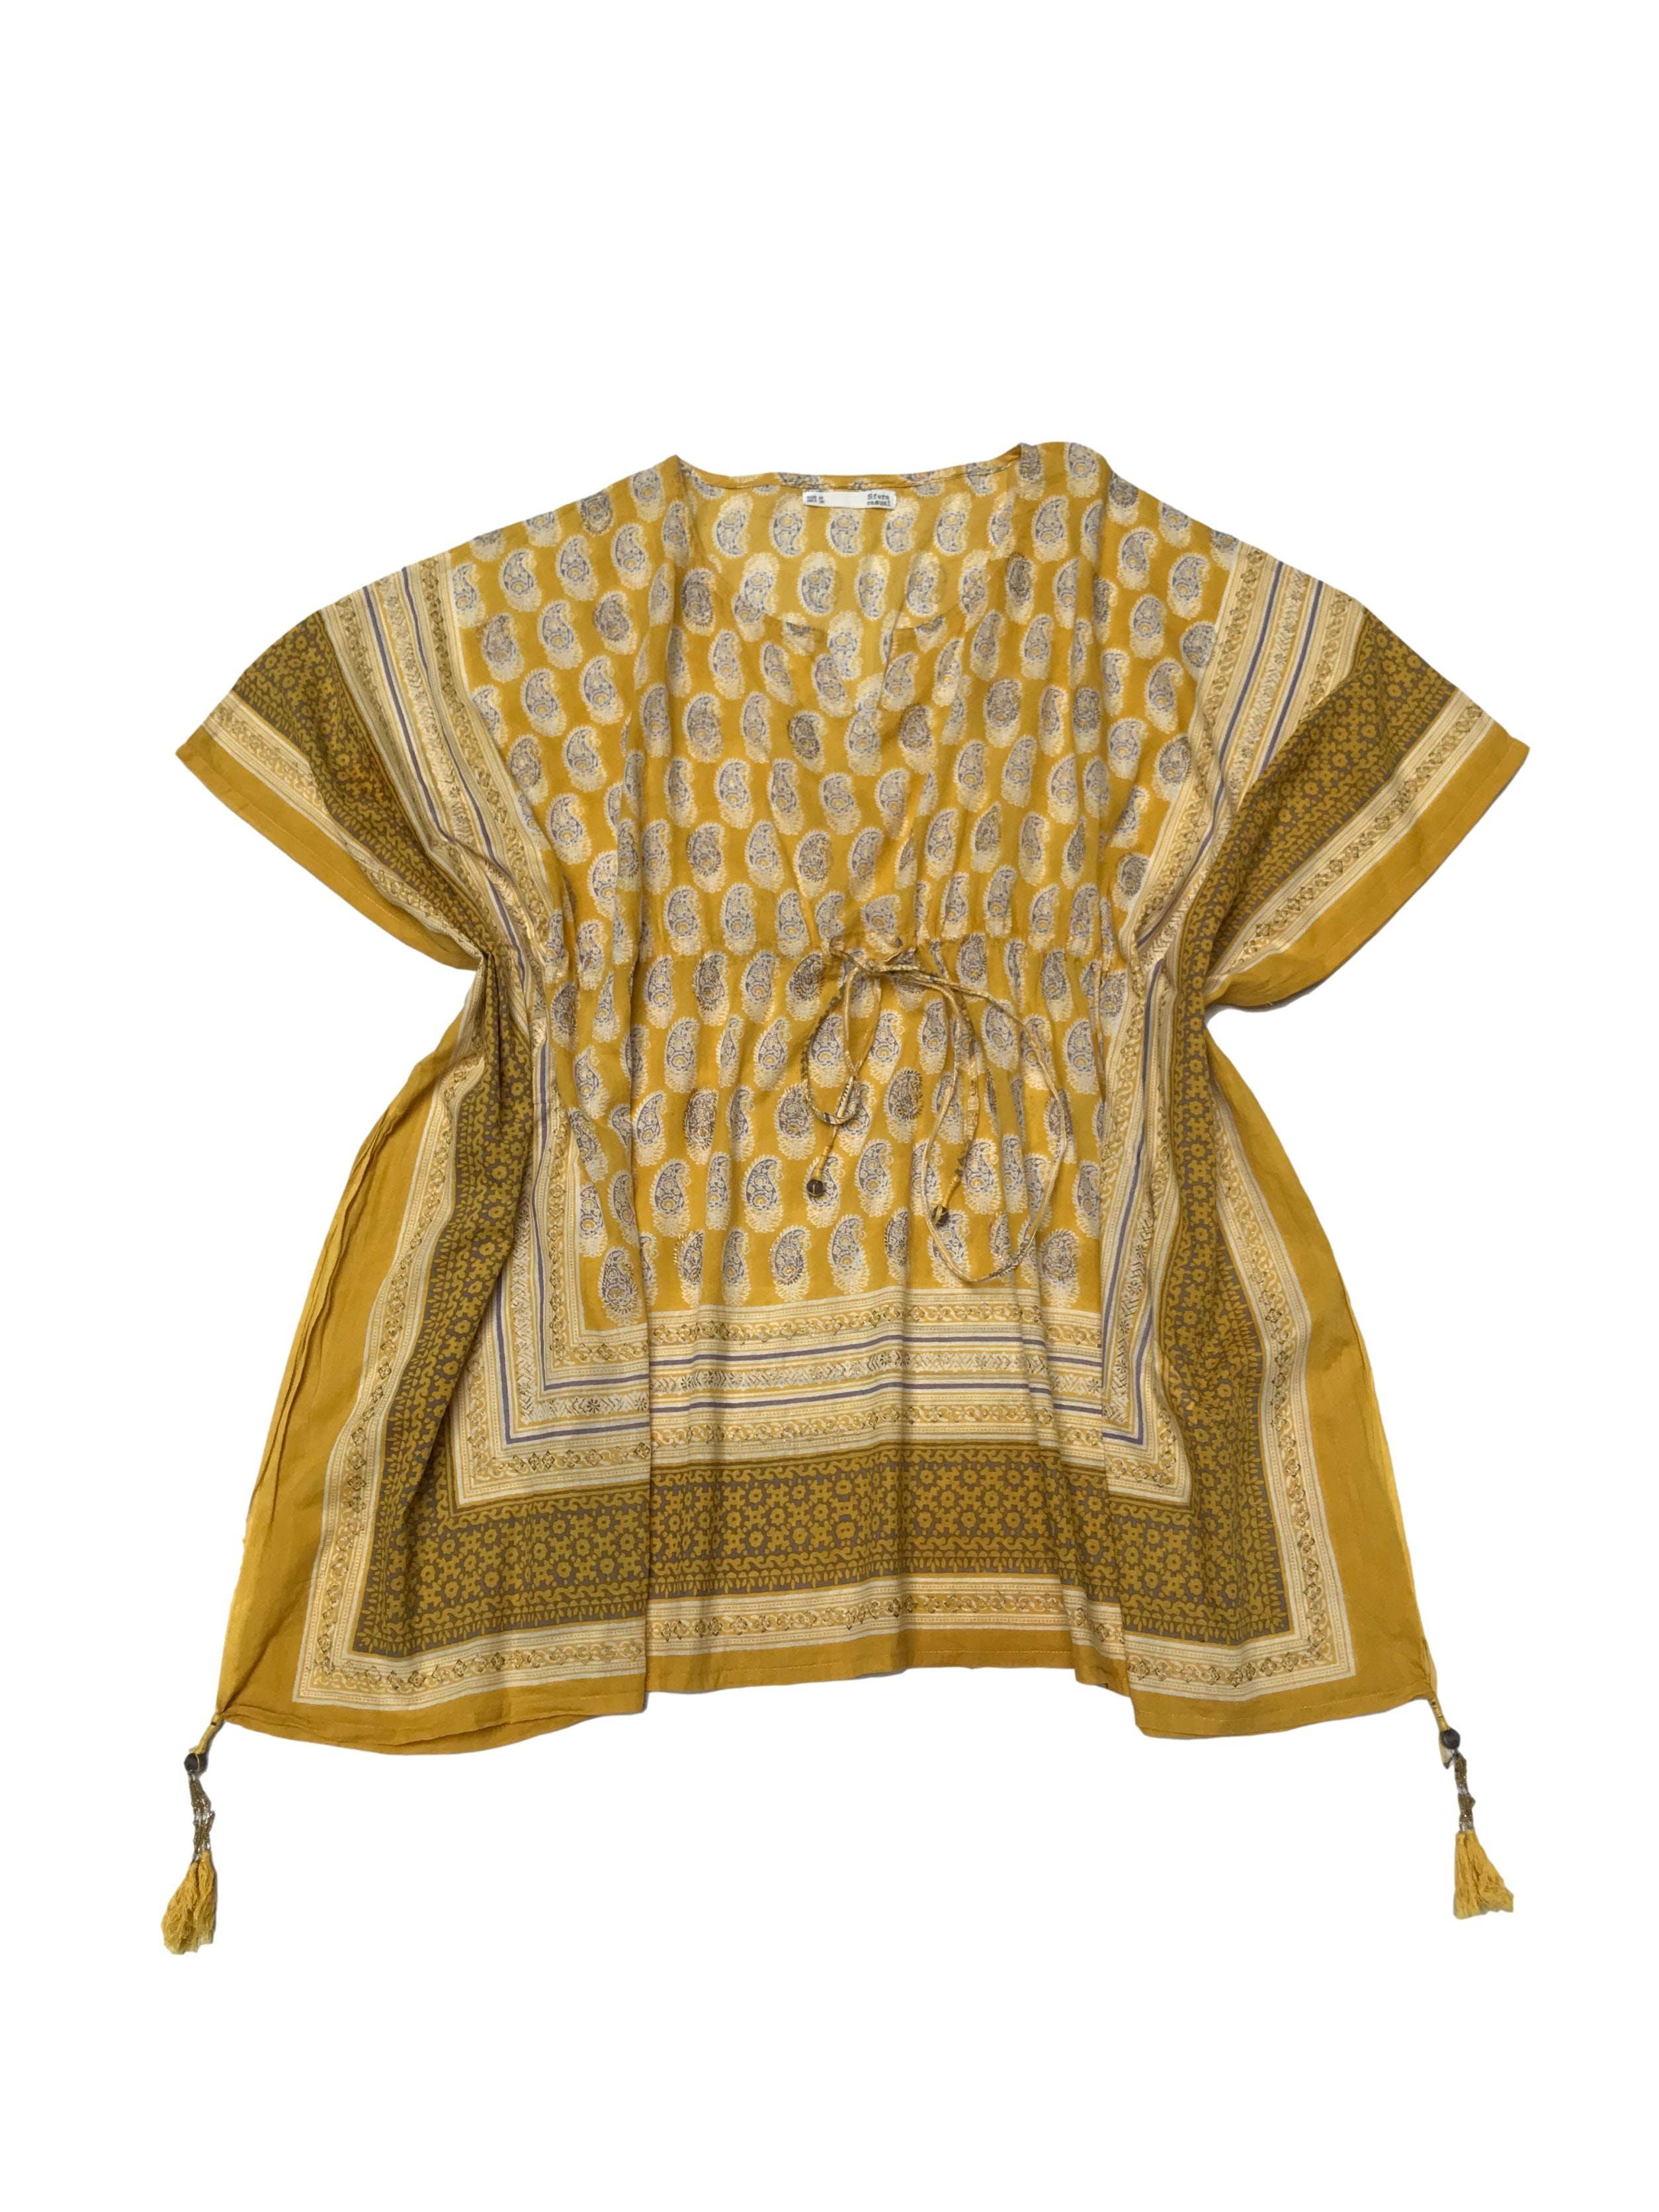 Salida de baño Sfera 100% algodón amarillo, corte murciélago con cintura regulable.